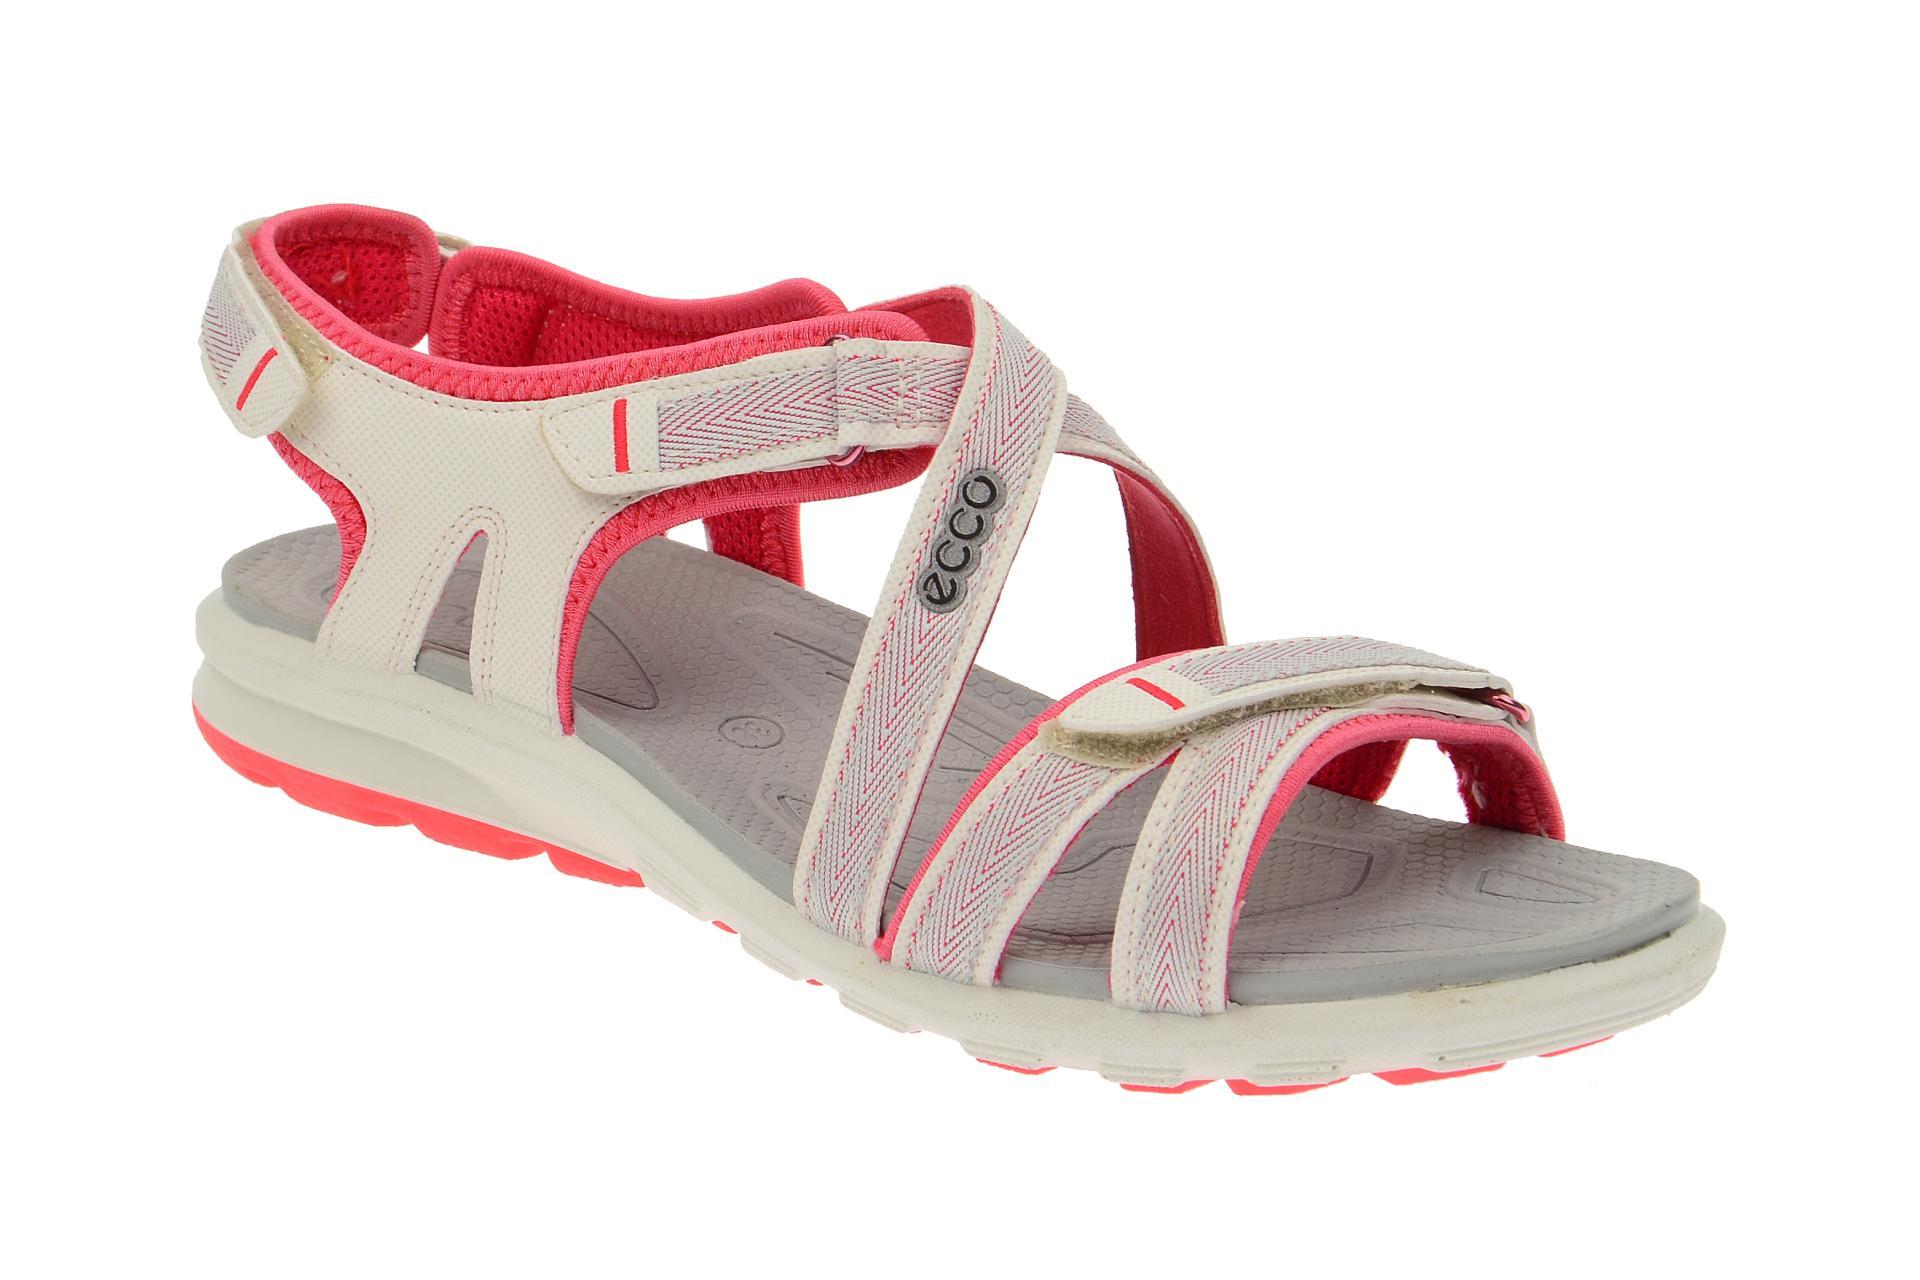 65f50bb07e65df Ecco Cruise Baja Sandale weiß pink 84155358324 - Schuhhaus Strauch Shop